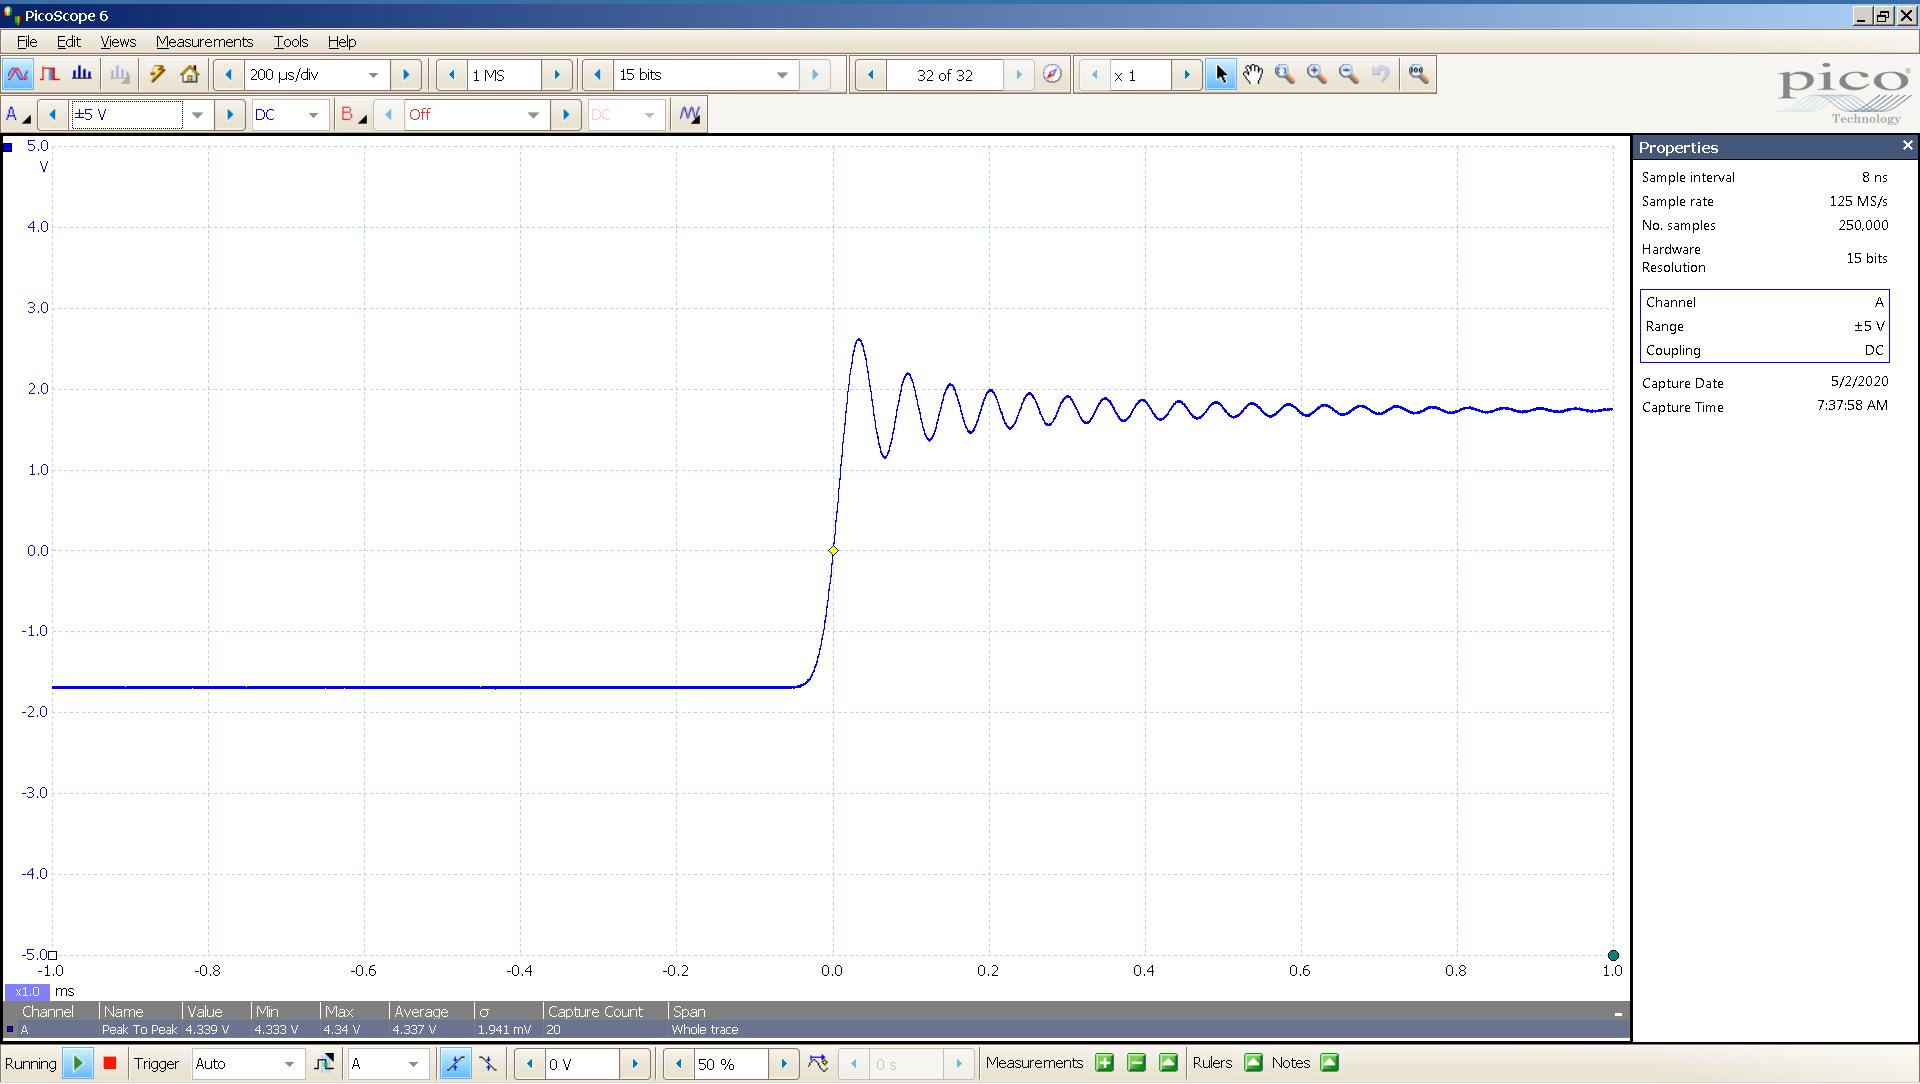 20200502-07 KTE Spring2 20 Hz sqr -4 dBFS 4 Vpp 200uS div SE - ASIO - OS PCM.png